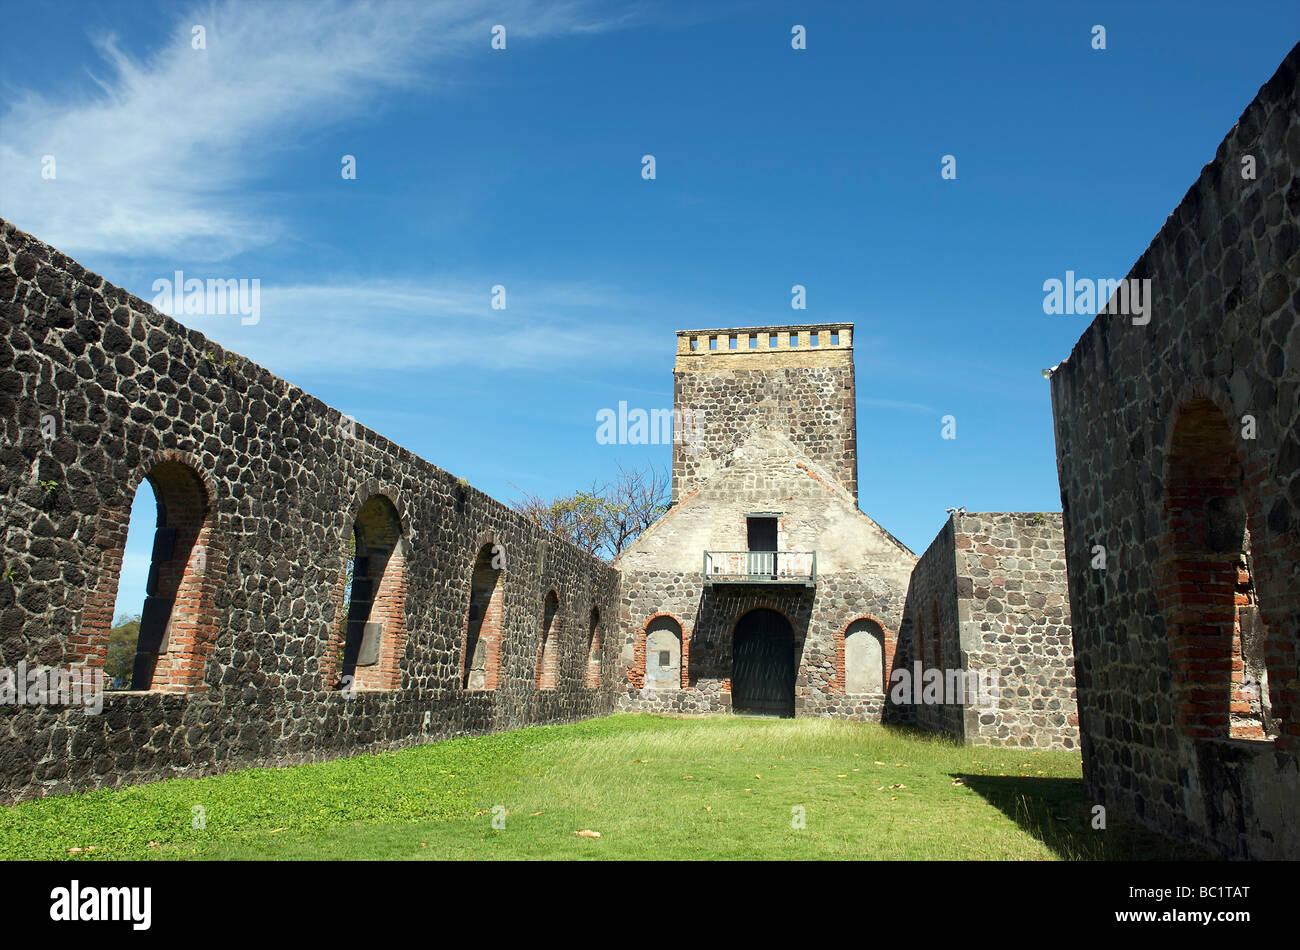 Sint Eustatius old protestant church - Stock Image